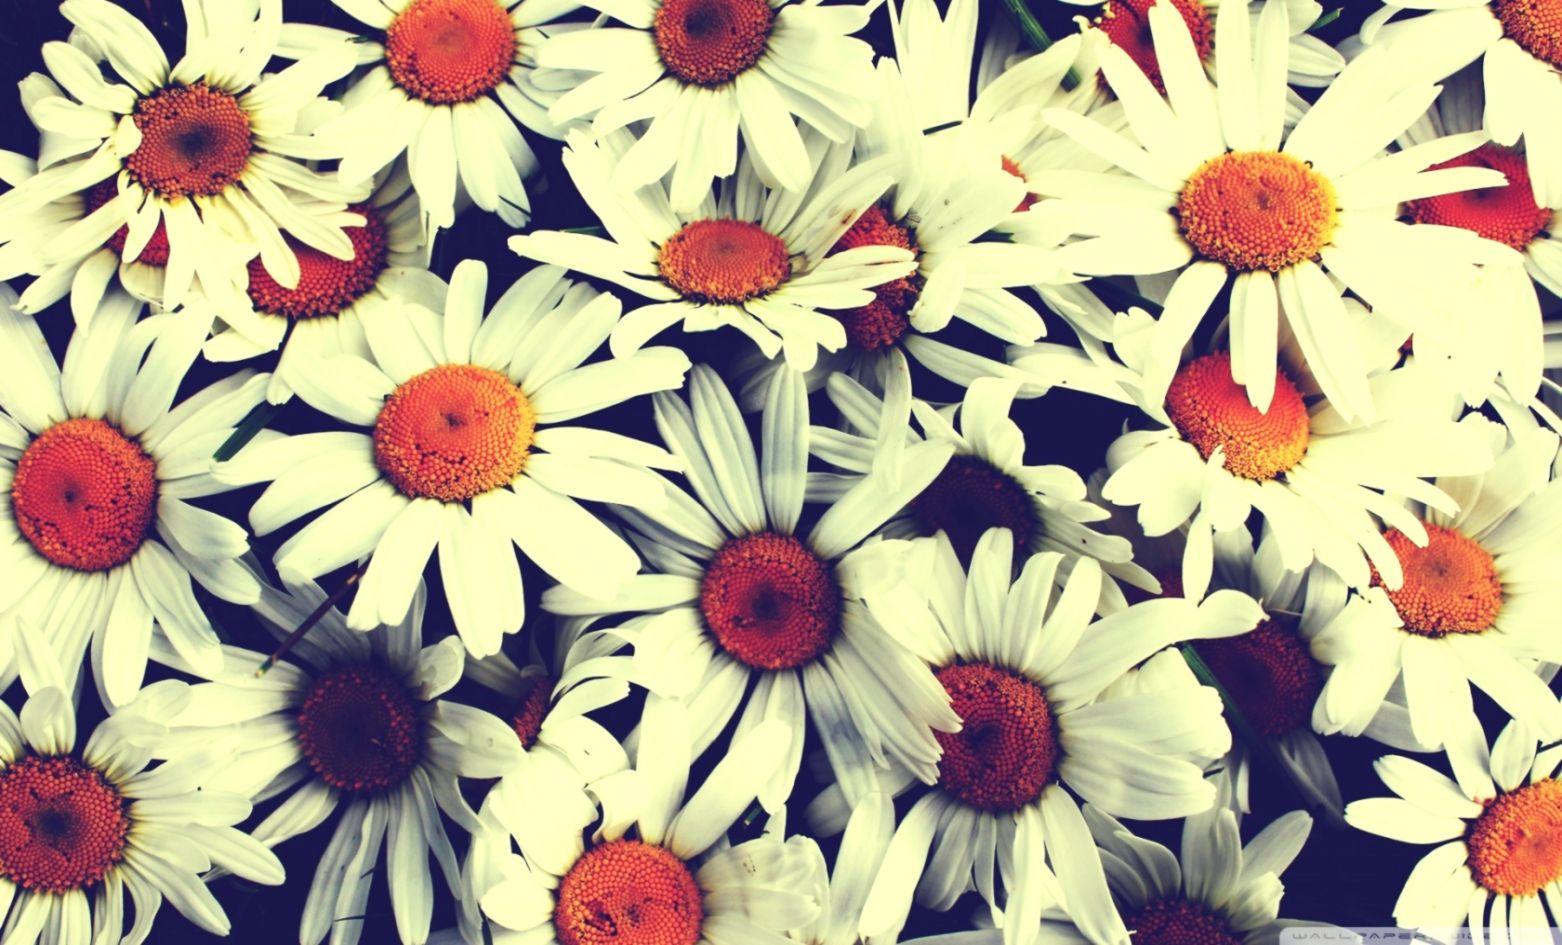 Beautiful Flowers Vintage Wallpaper Hd Download Wallpapers